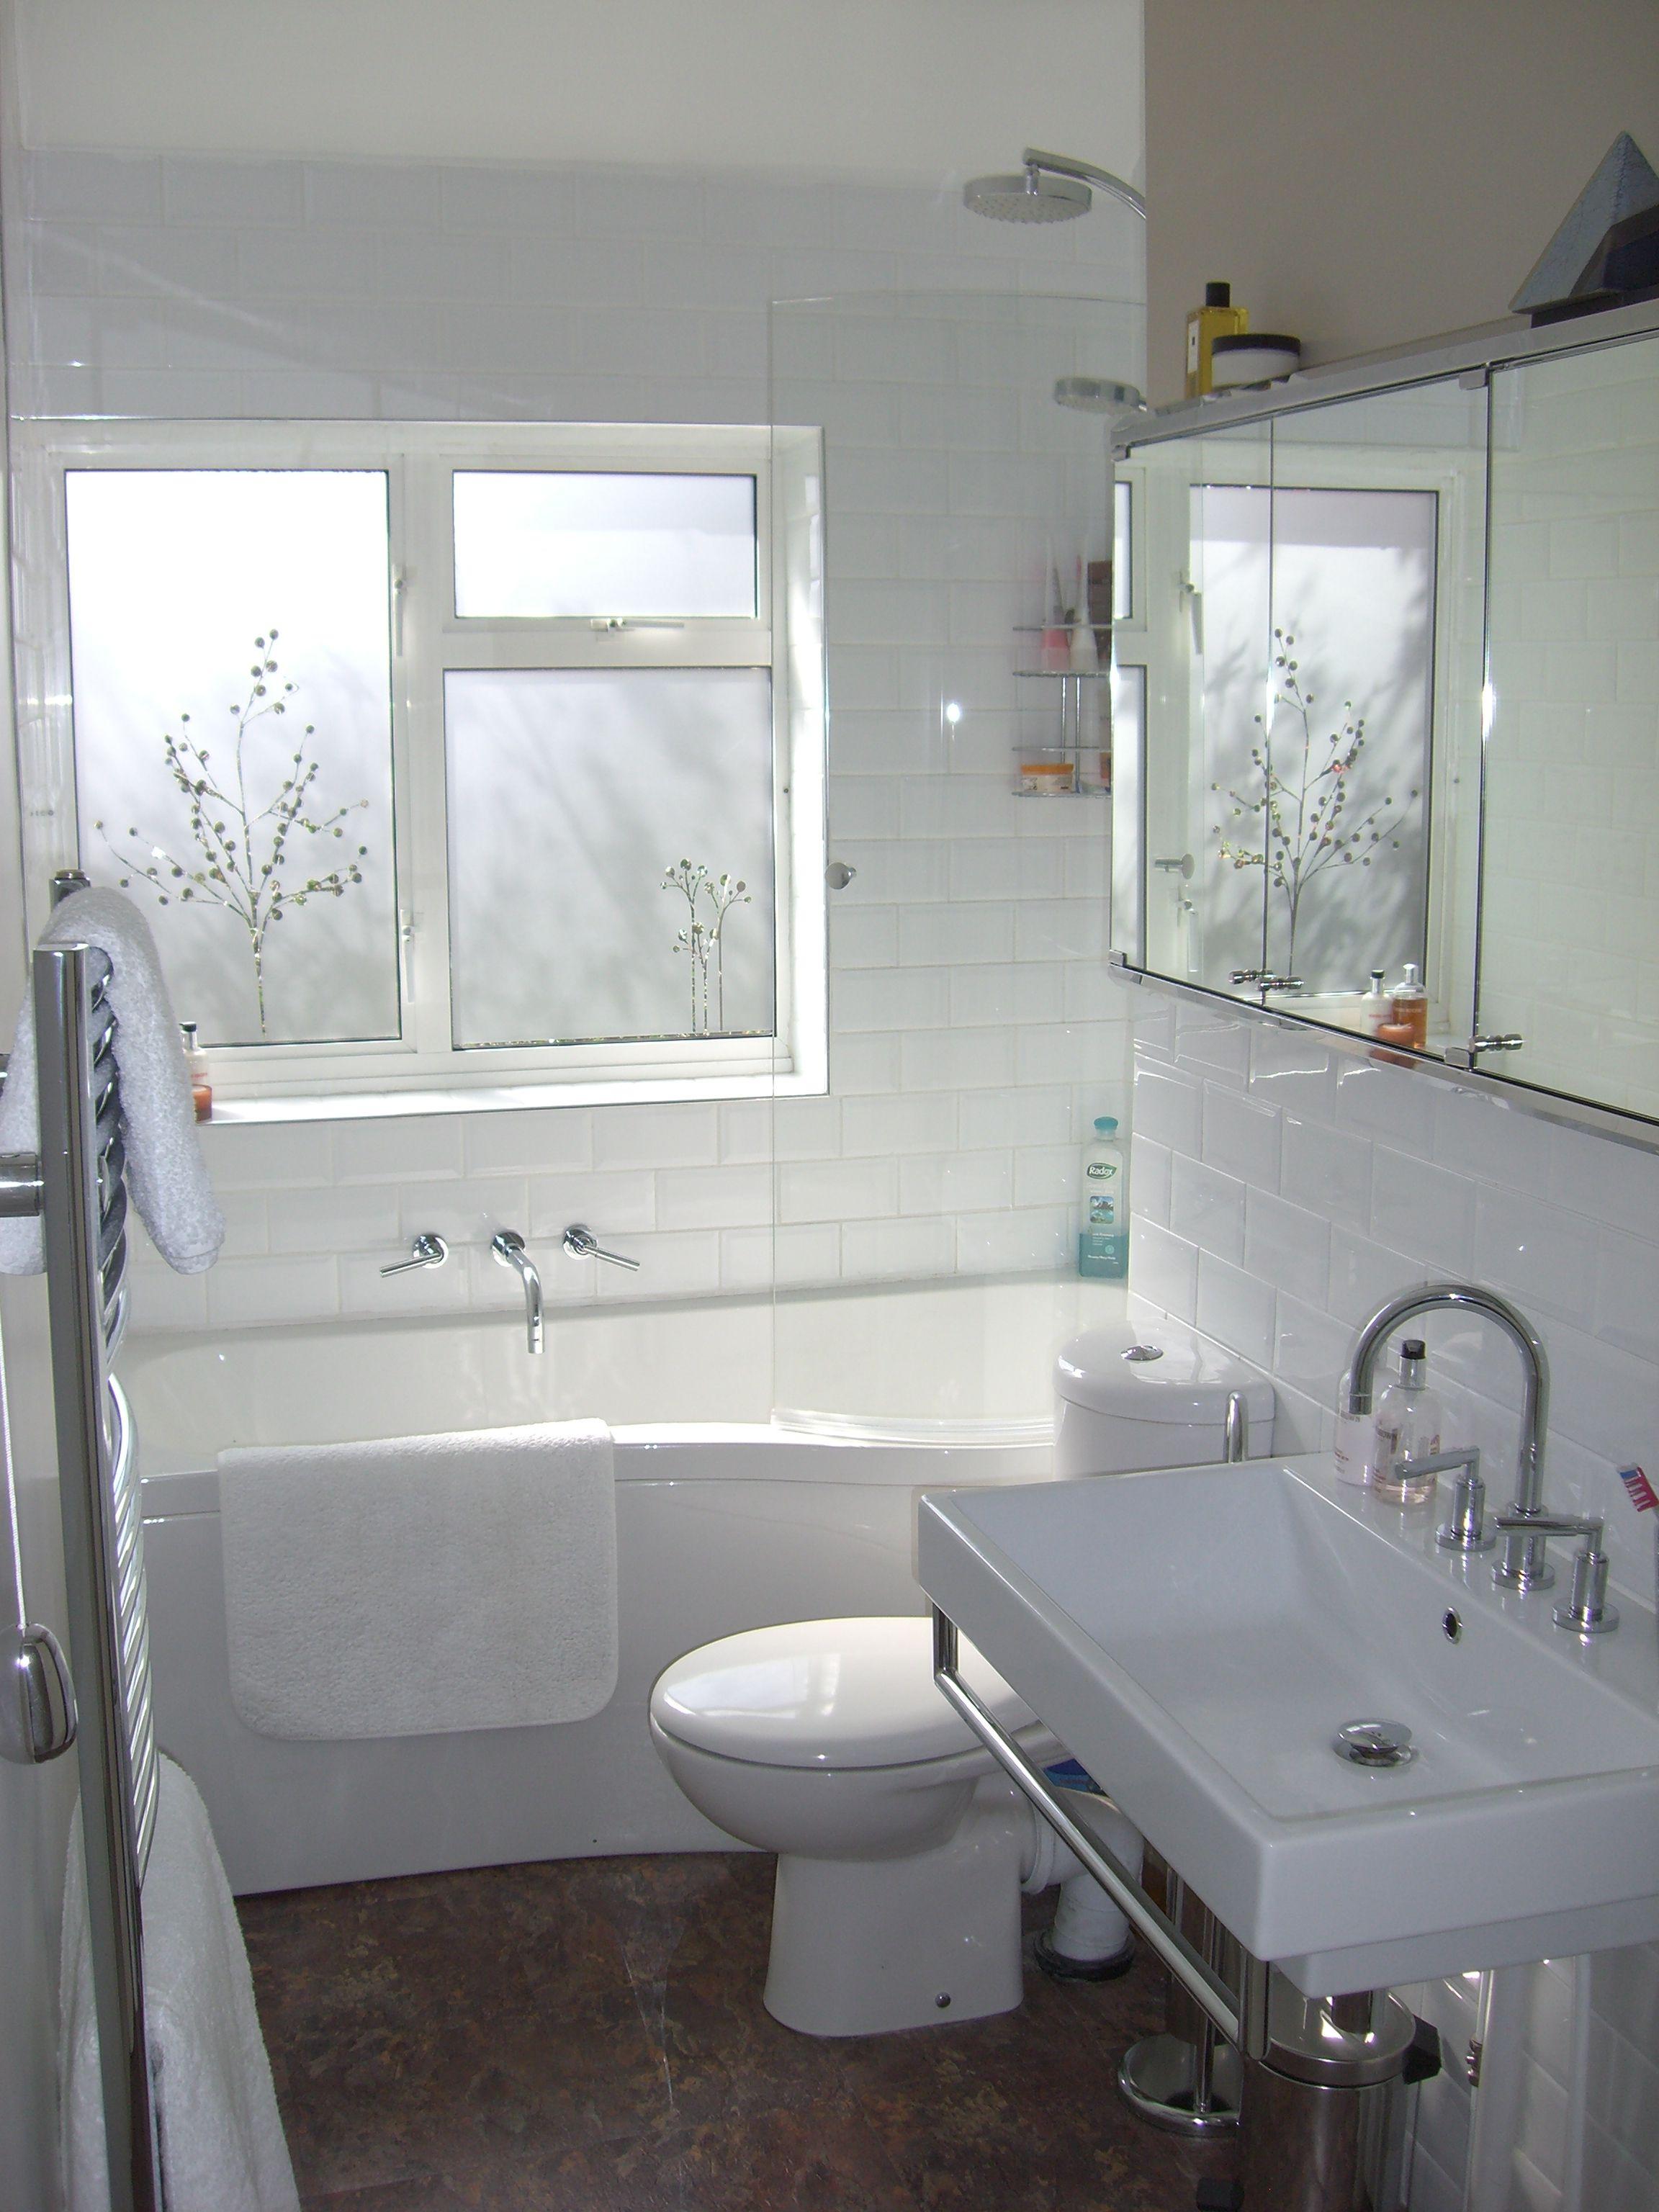 tiny narrow bathroom designs bathroom tile medium size small narrow  bathroom ideas tub shower kitchen traditional .